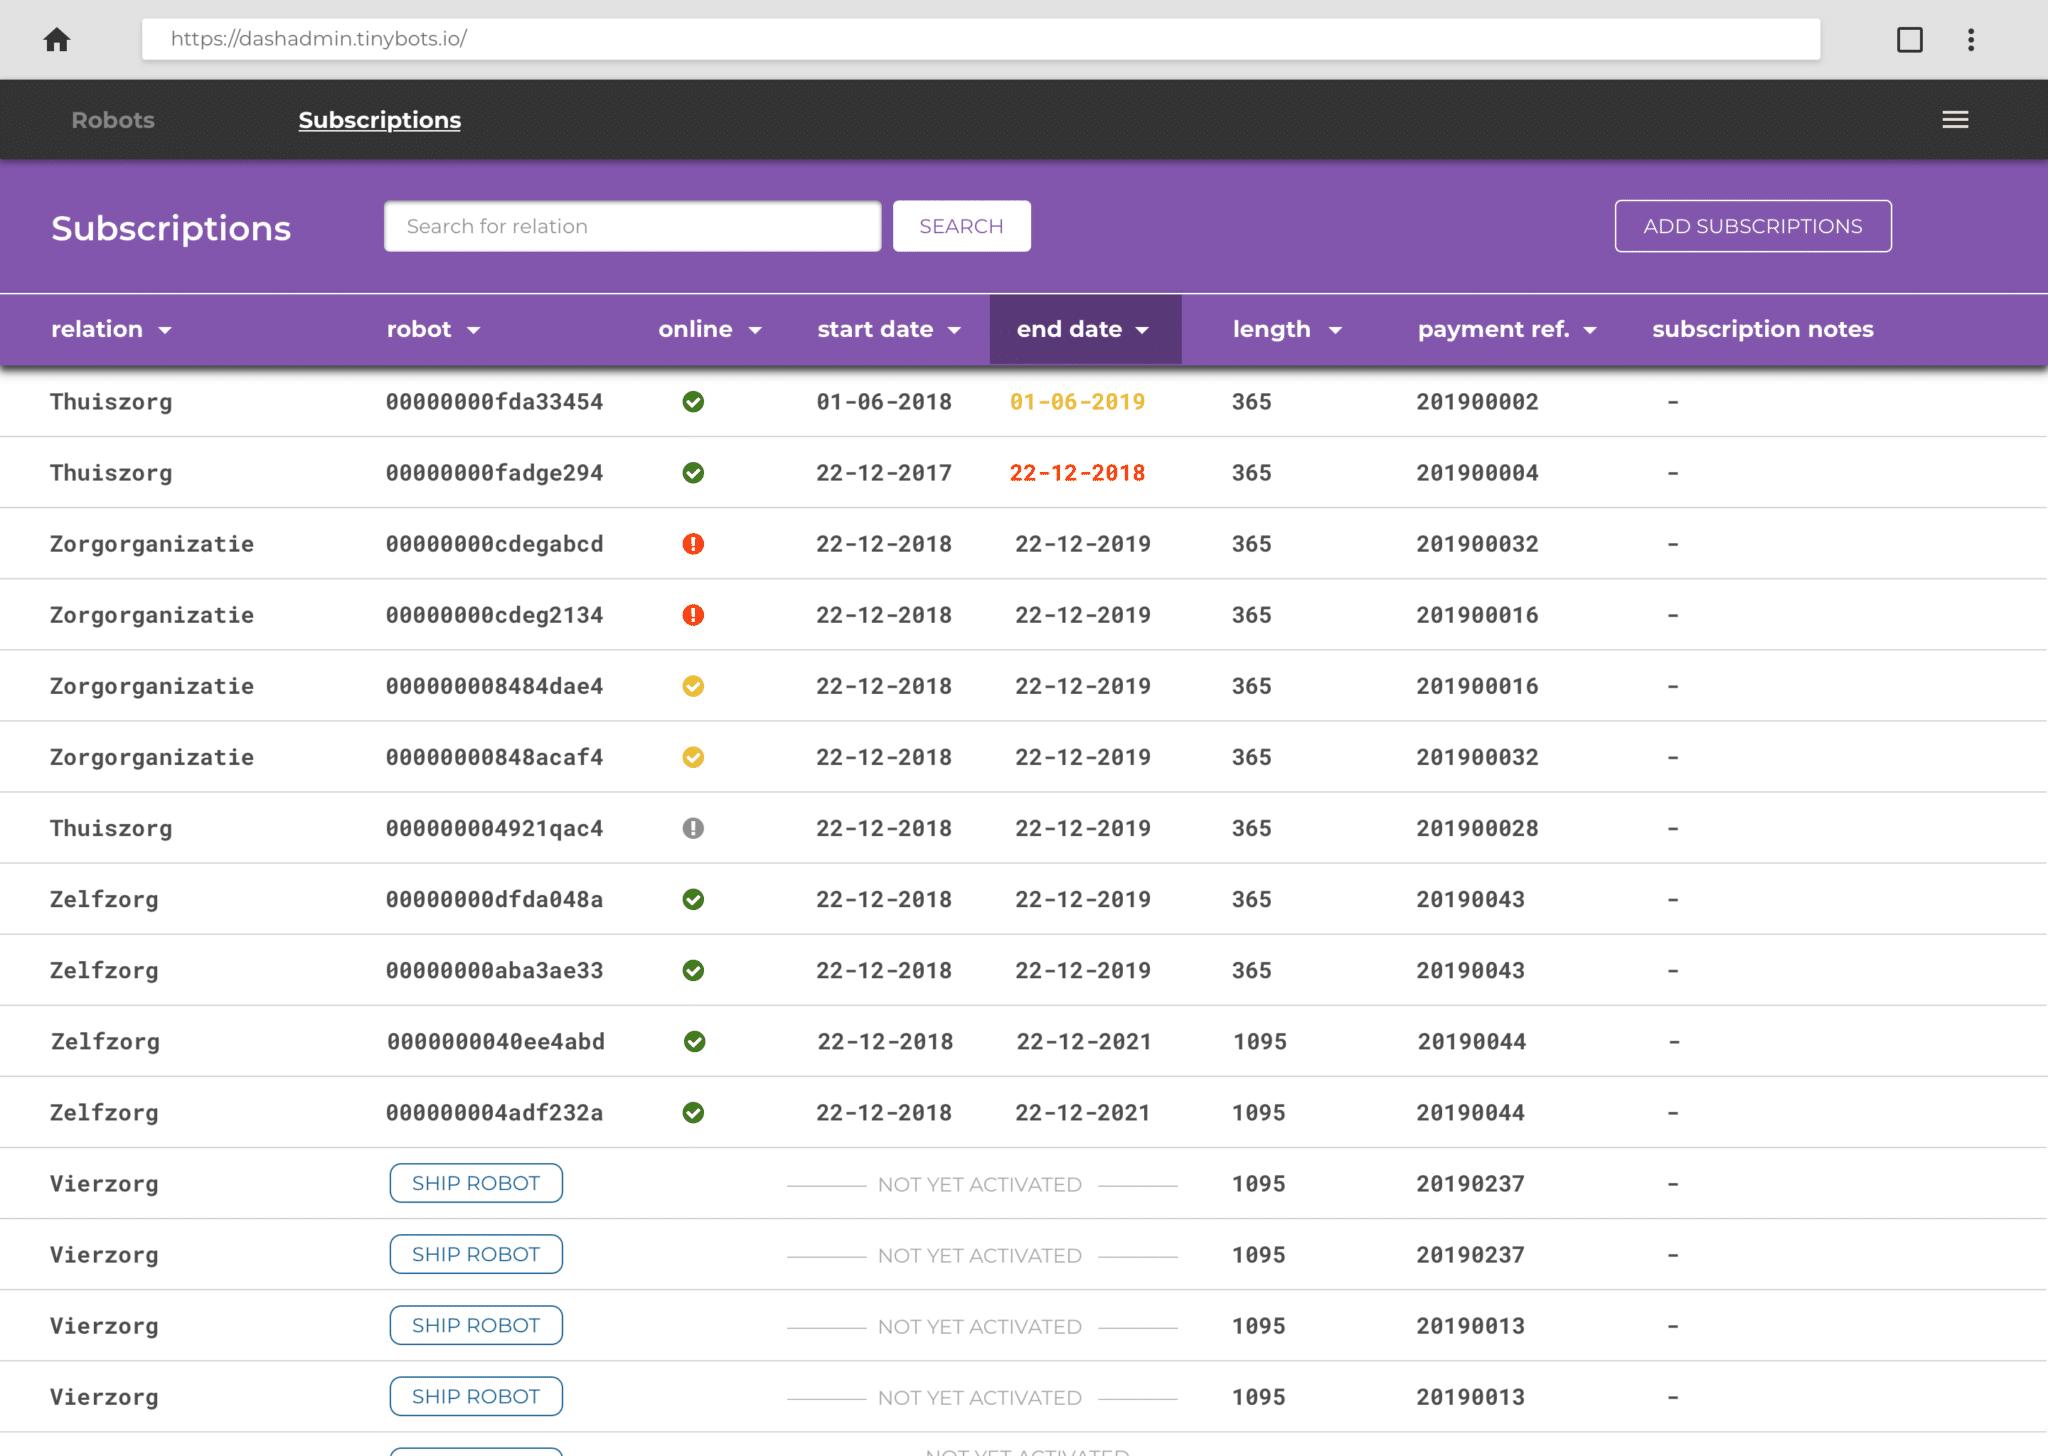 A screenshot of an administrative dashboard